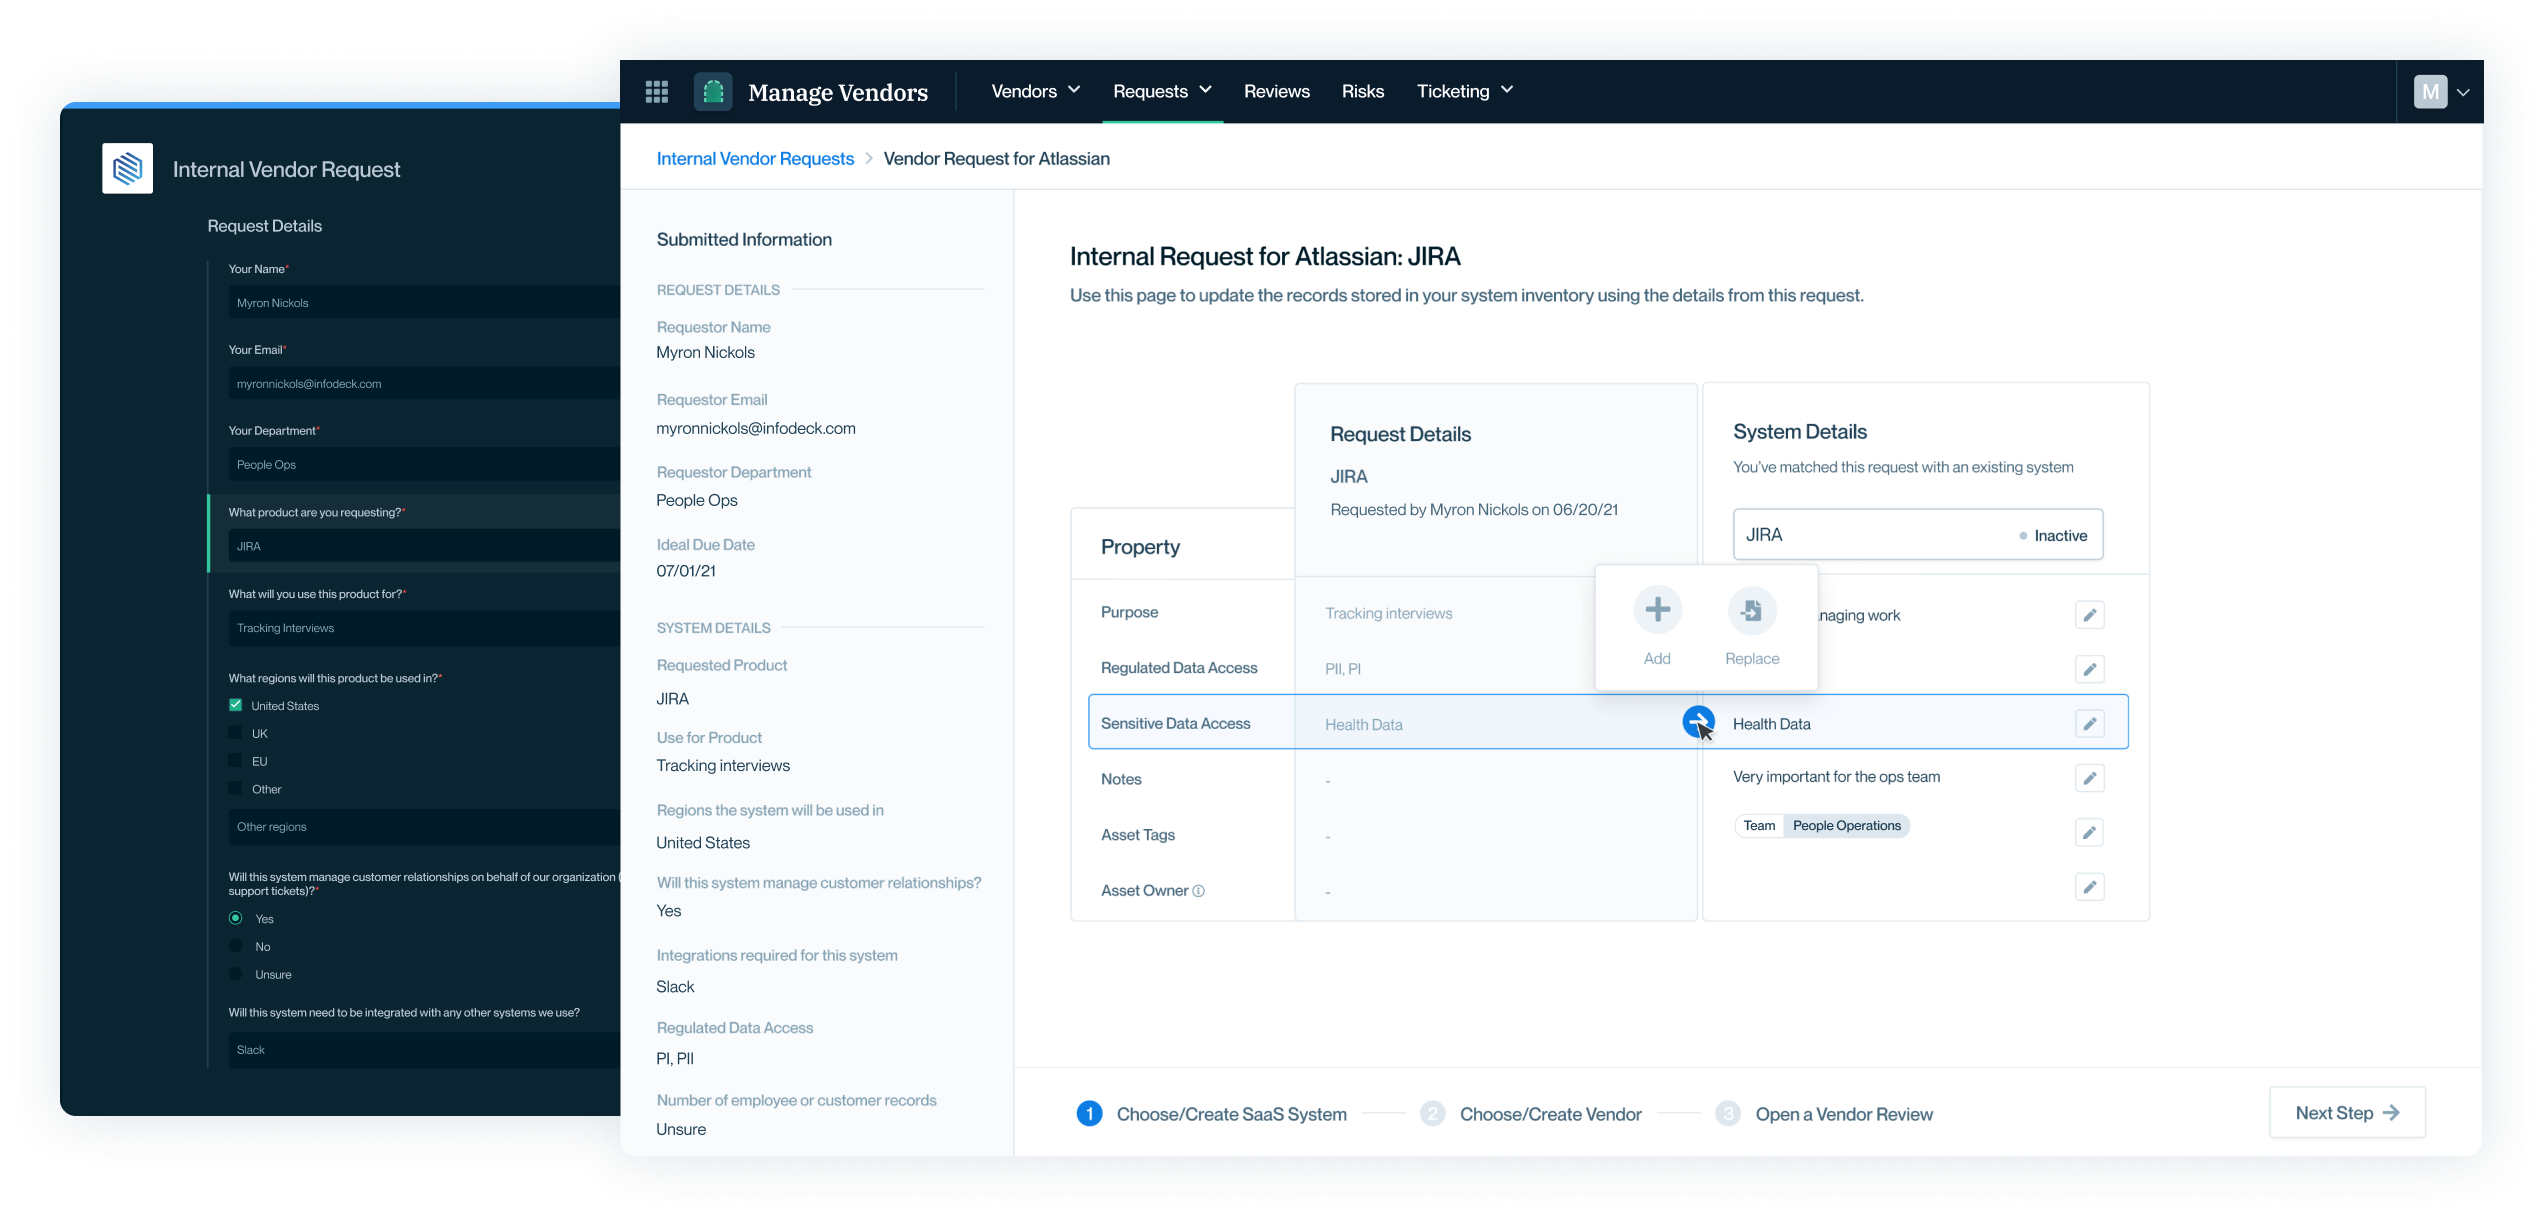 Screenshot of internal vendor request form and processing.